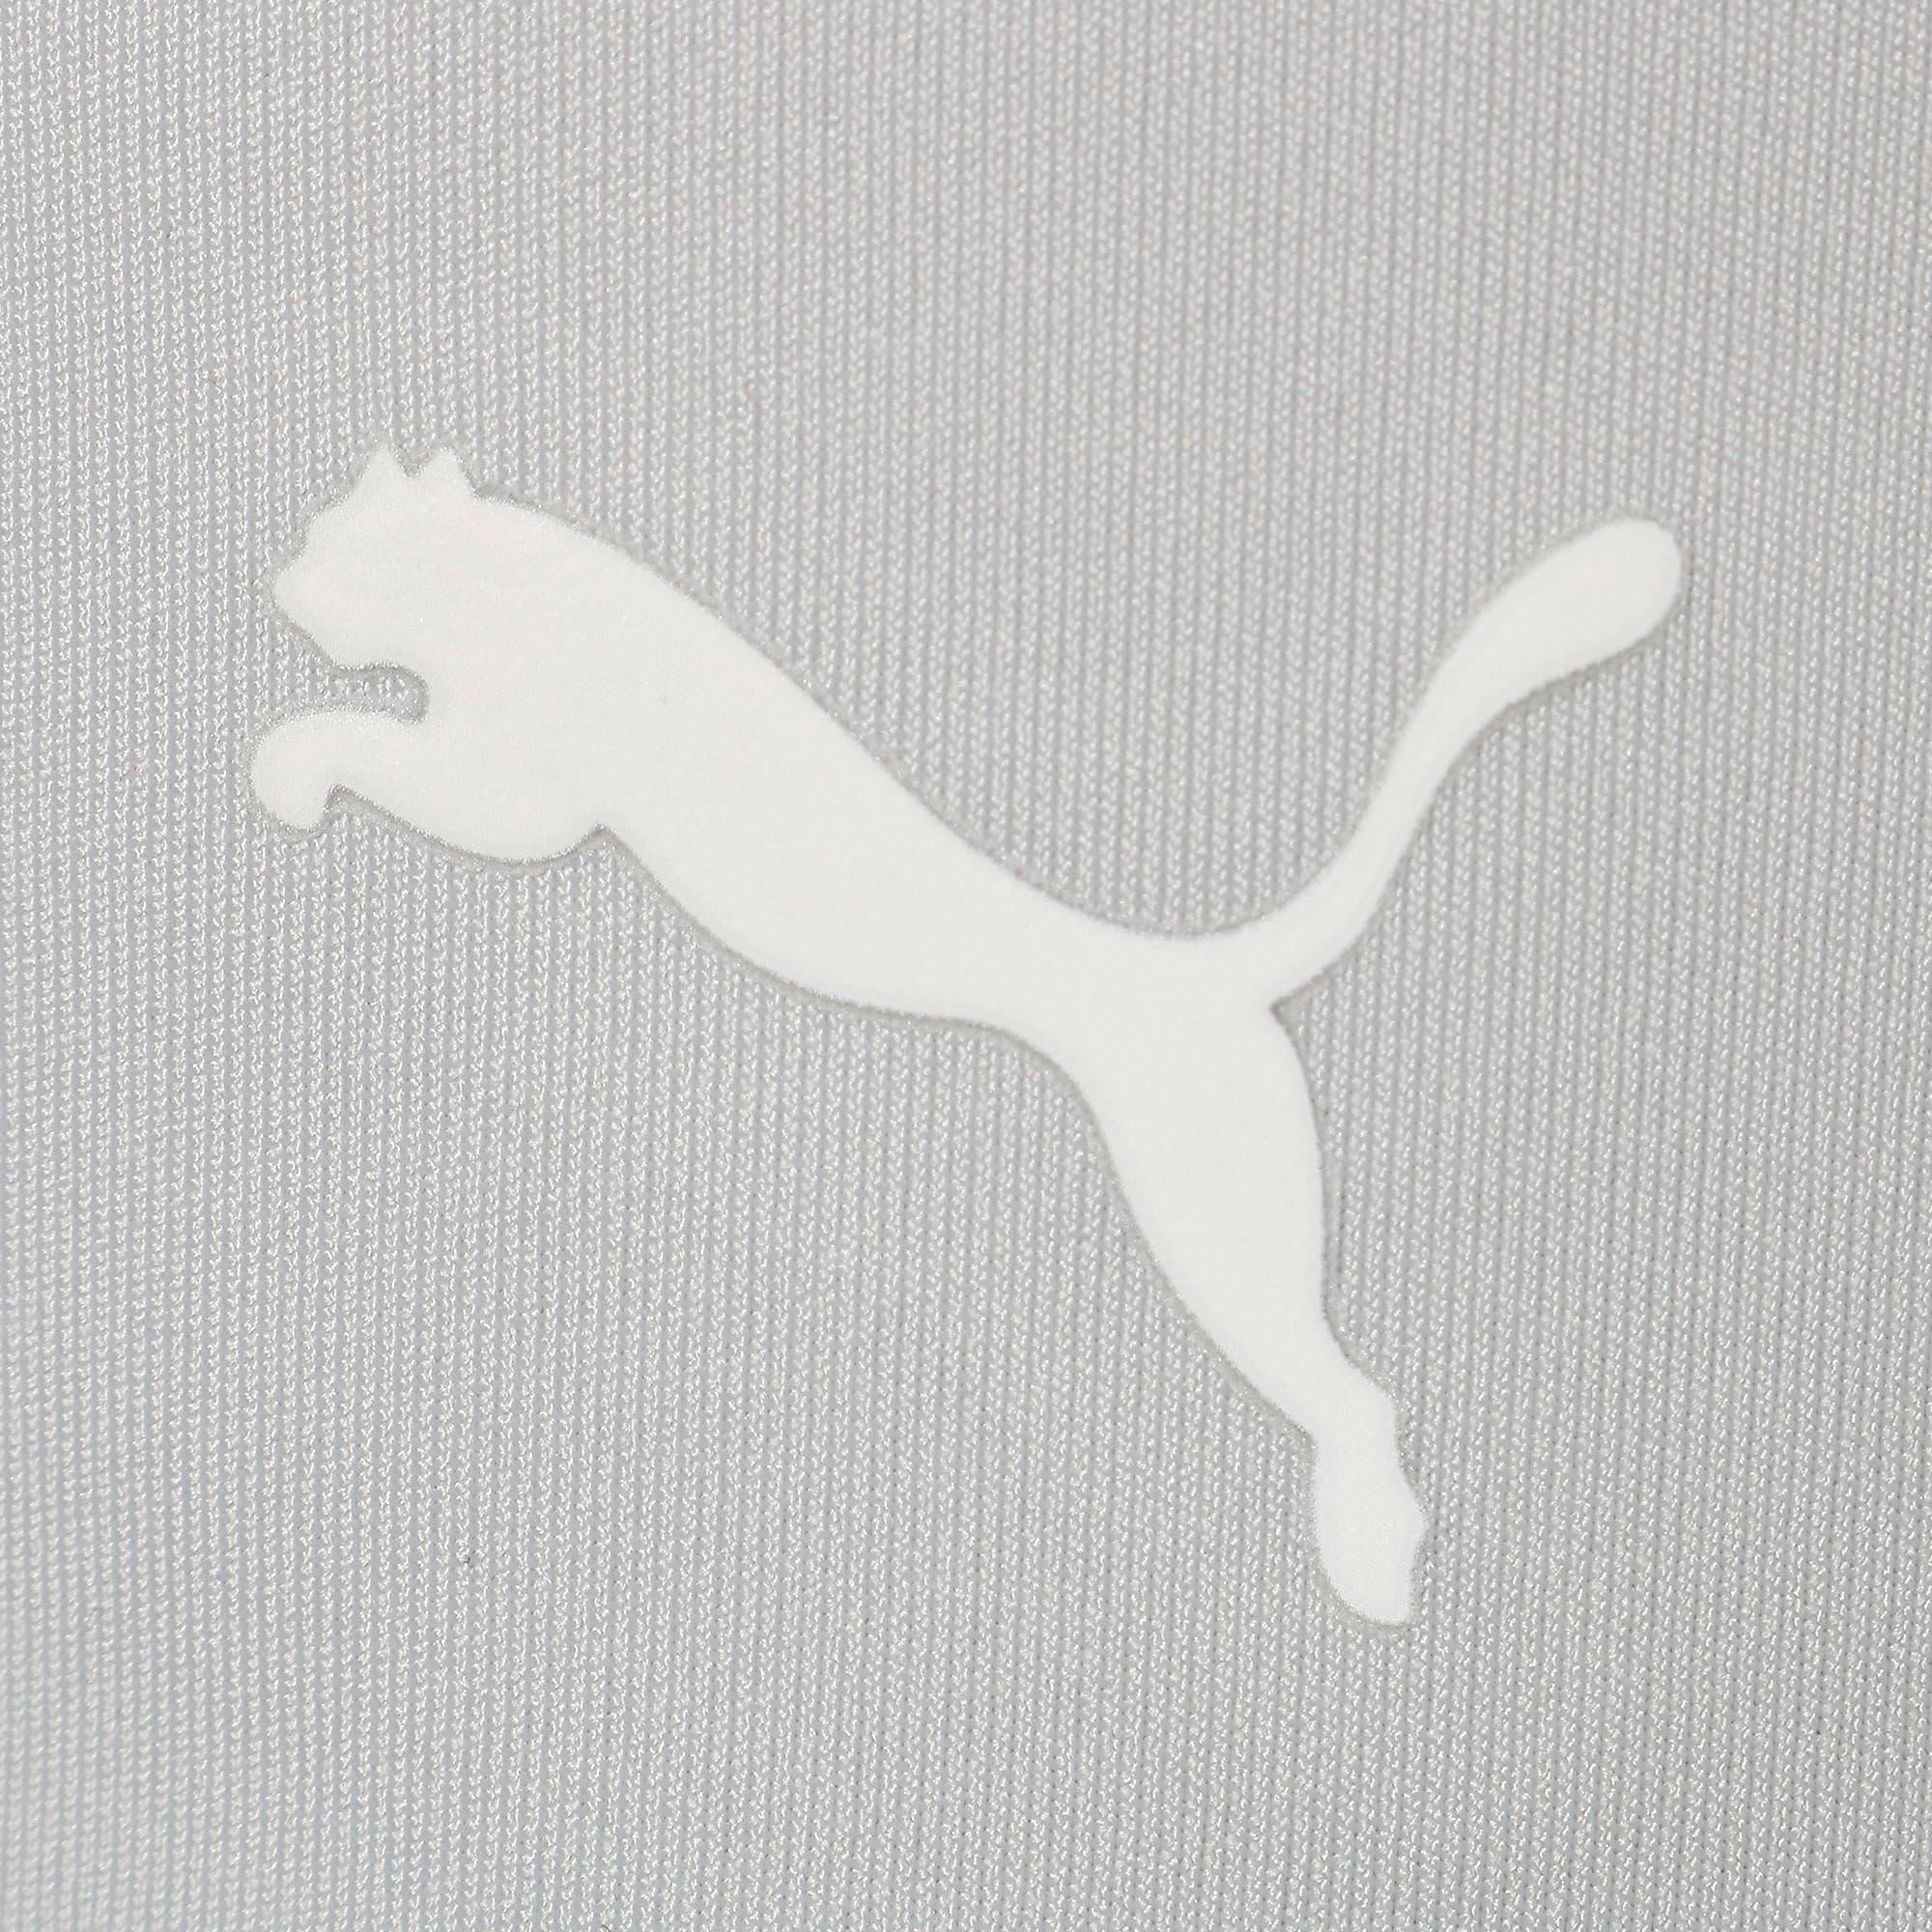 Thumbnail 7 of SG x PUMA ウィメンズ ショーツ, Glacier Gray-Puma White, medium-JPN